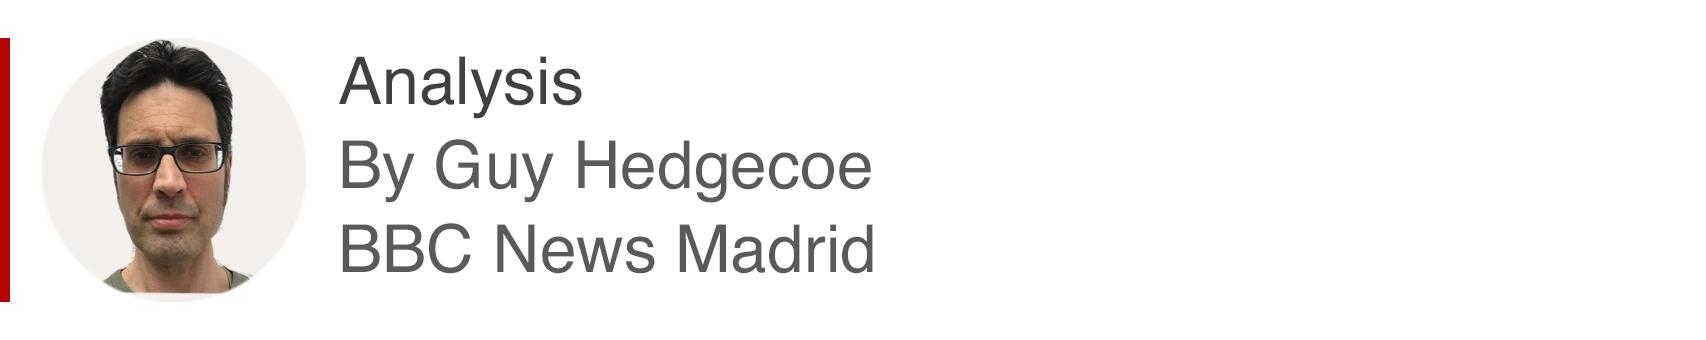 Guy Hedgecoe